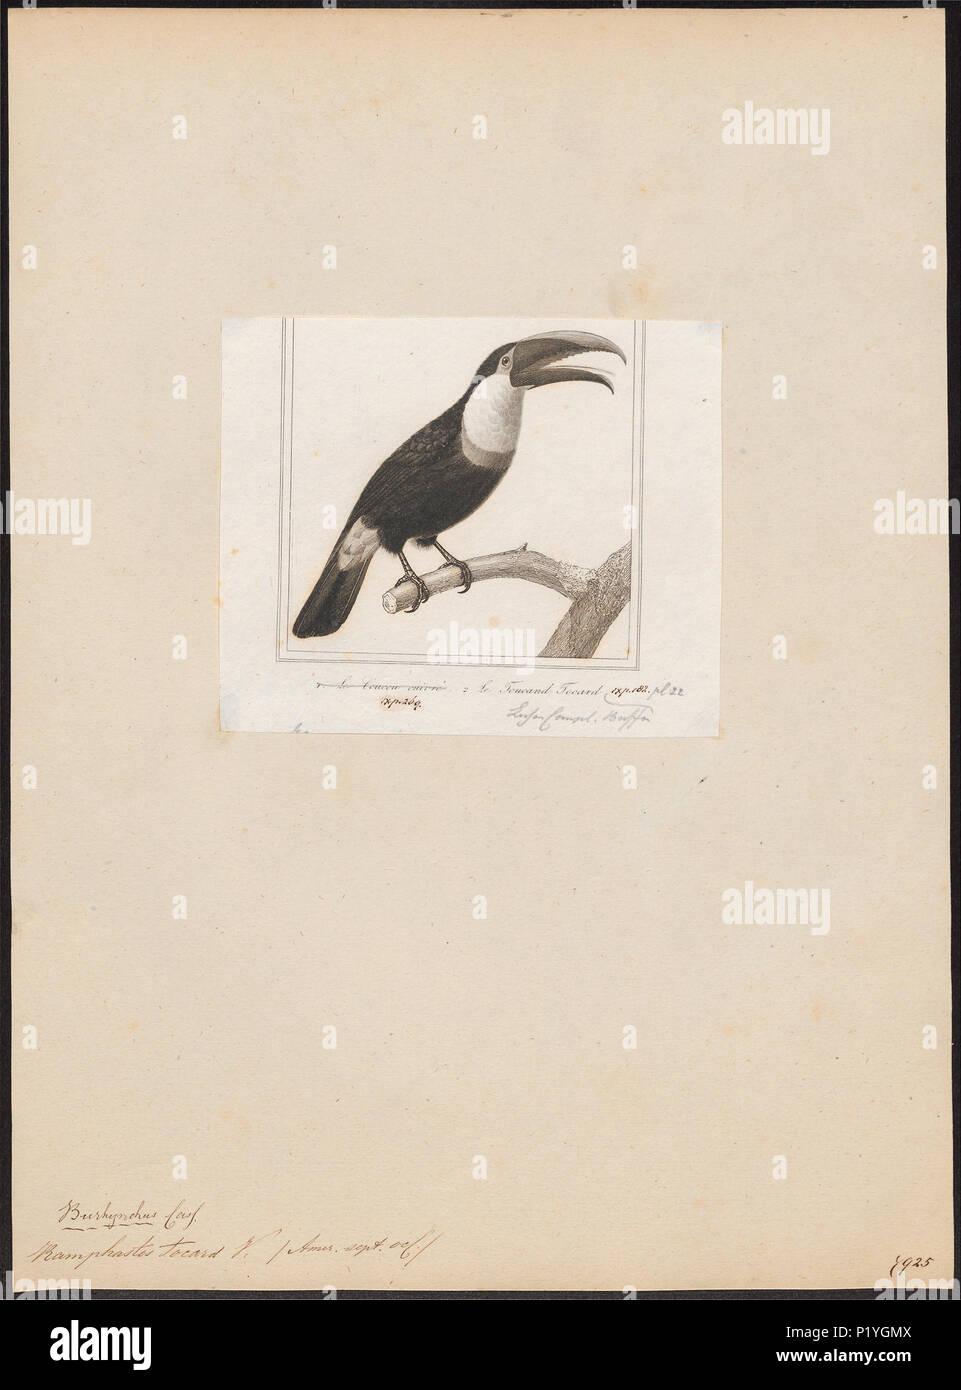 275 Ramphastos tocard - 1838 - Print - Iconographia